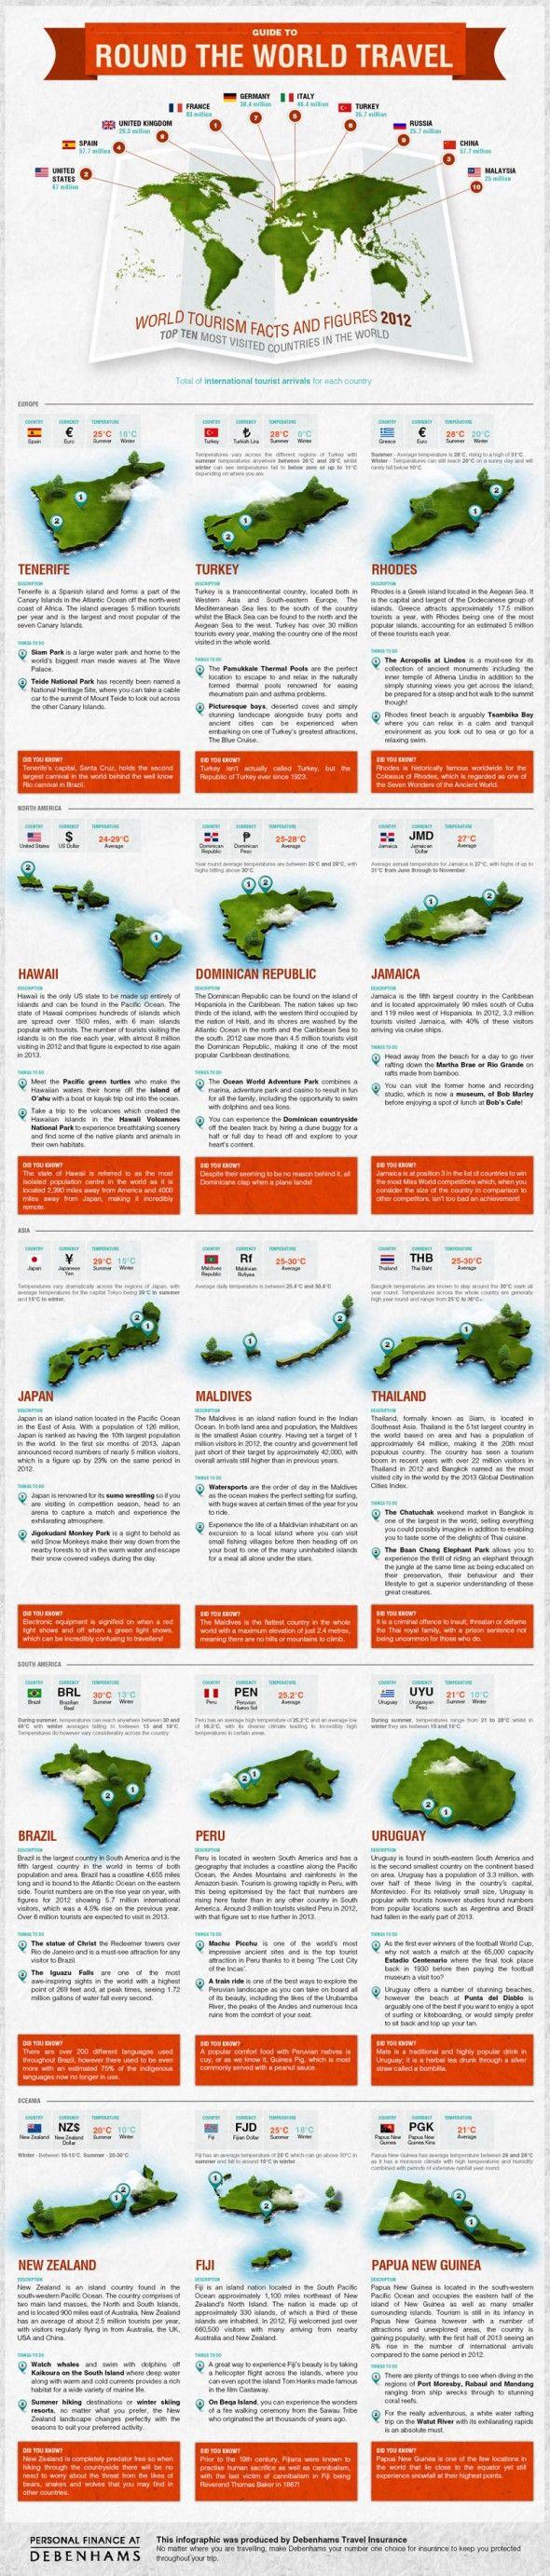 Infographic: Debenhams Guide to Round the World Travel